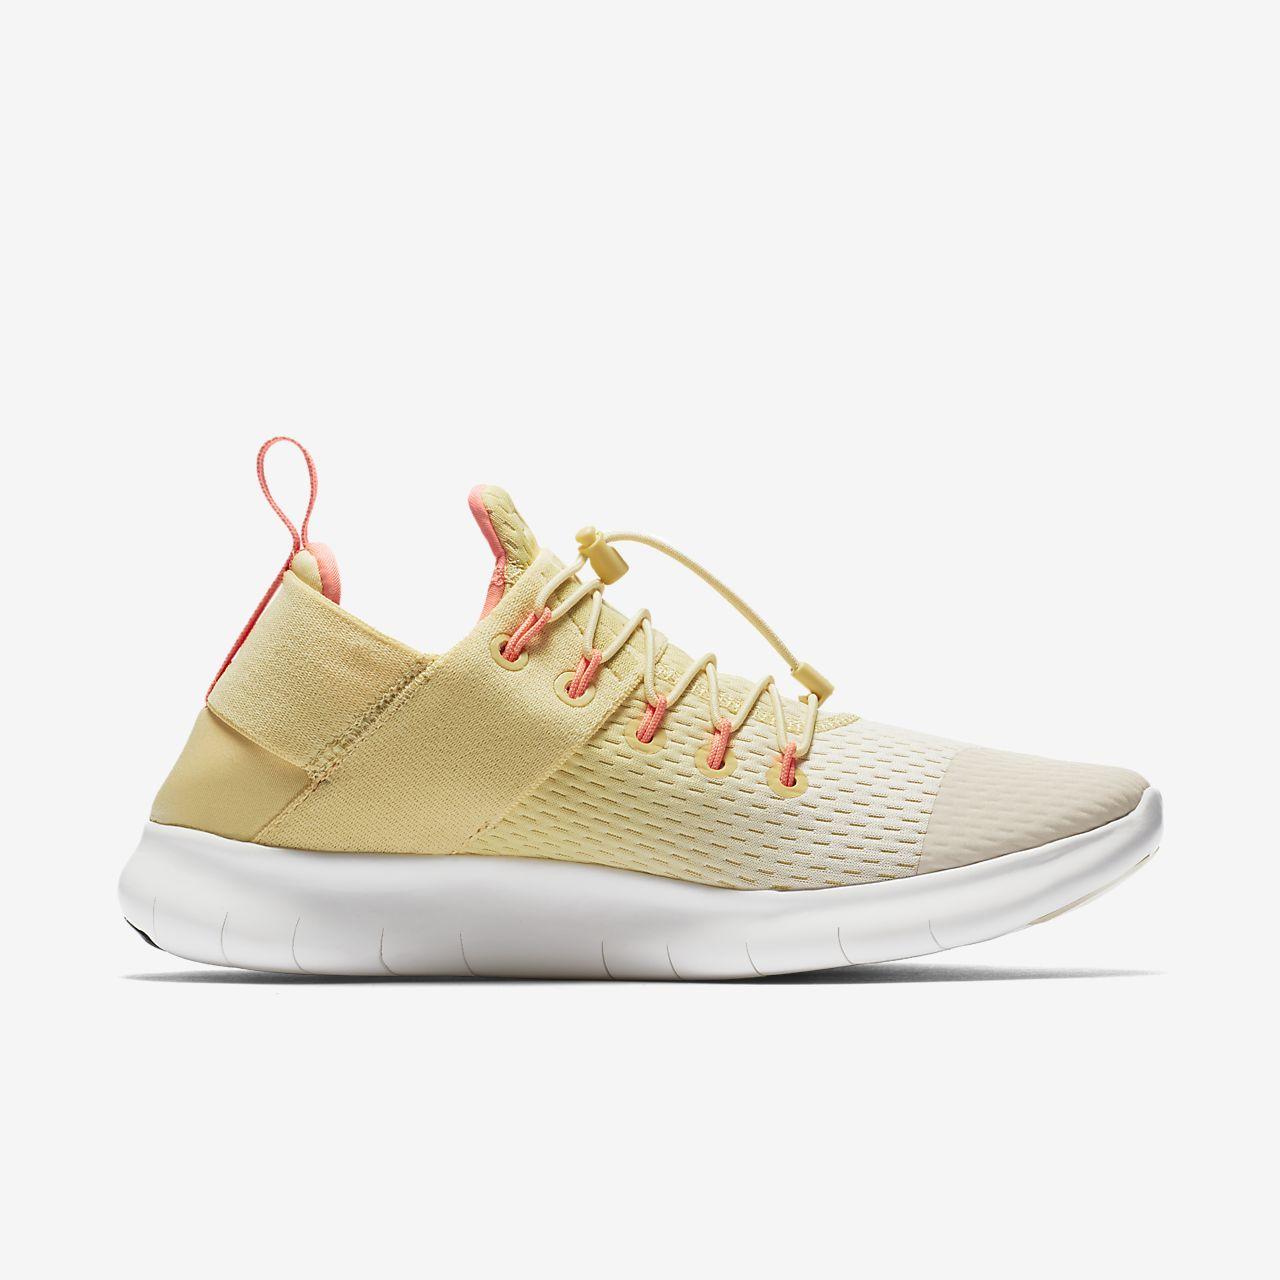 Nike Free RN Commuter 2017 Damen-Laufschuh